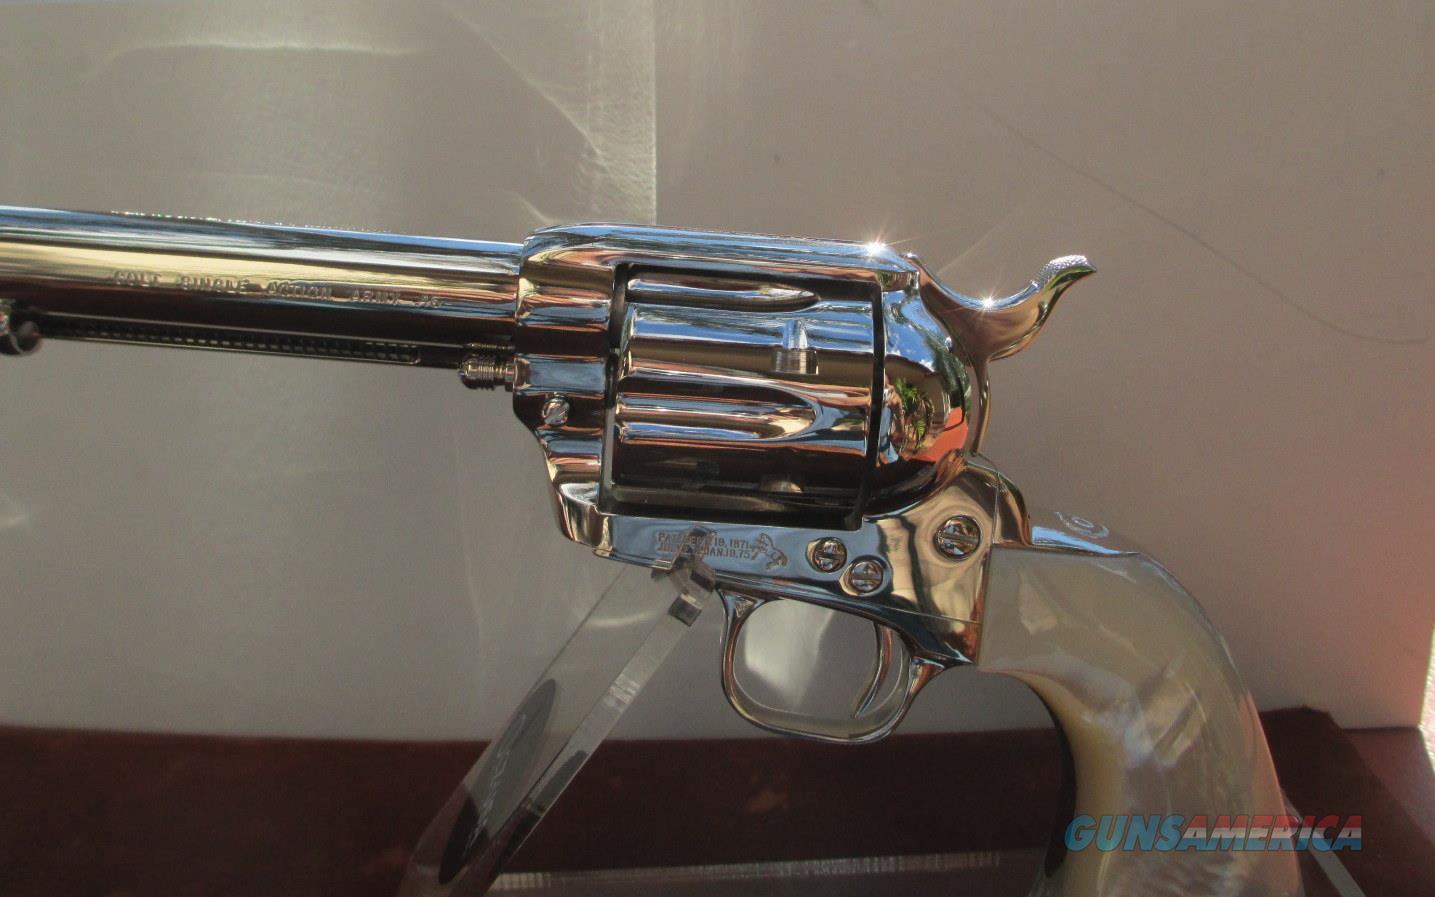 "COLT CUSTOM SHOP NICKEL SAA 5 1/2"" BARREL WITH PEARL GRIPS  Guns > Pistols > Colt Single Action Revolvers - 3rd Gen."